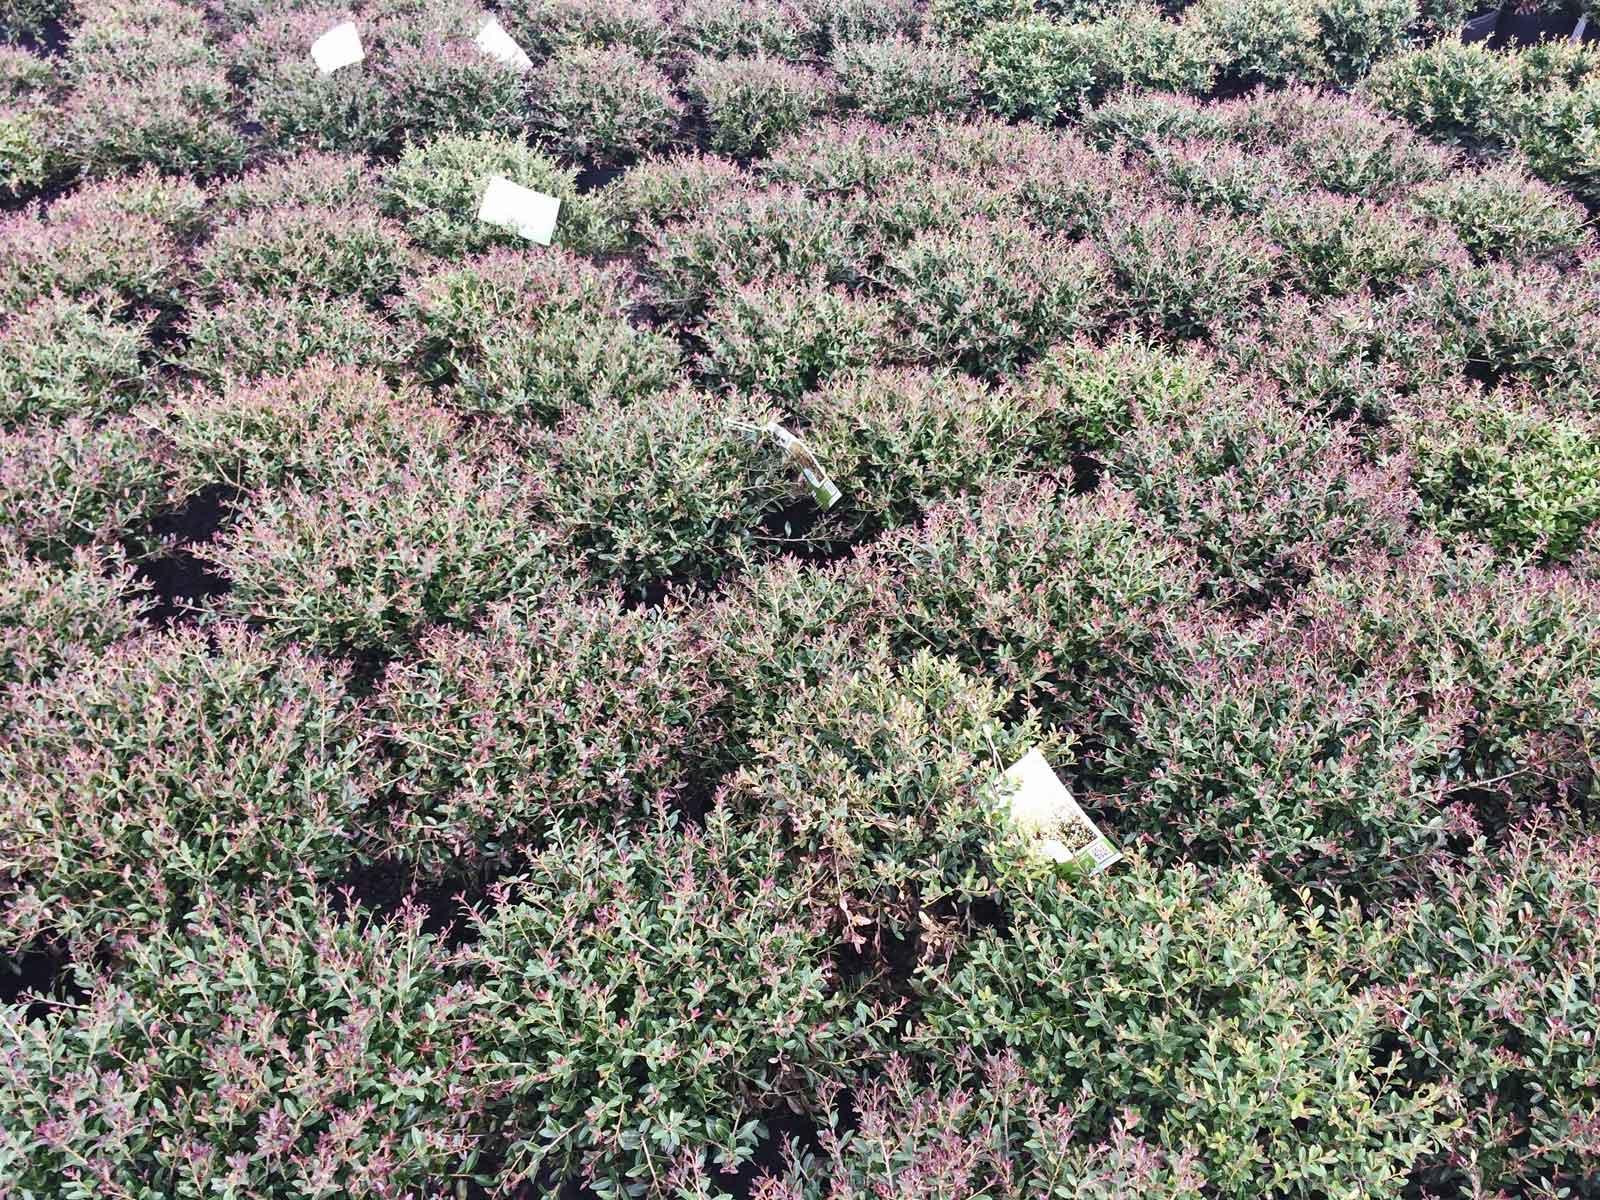 dwarf yaupon holly (ilex vomitoria 'bordeaux')